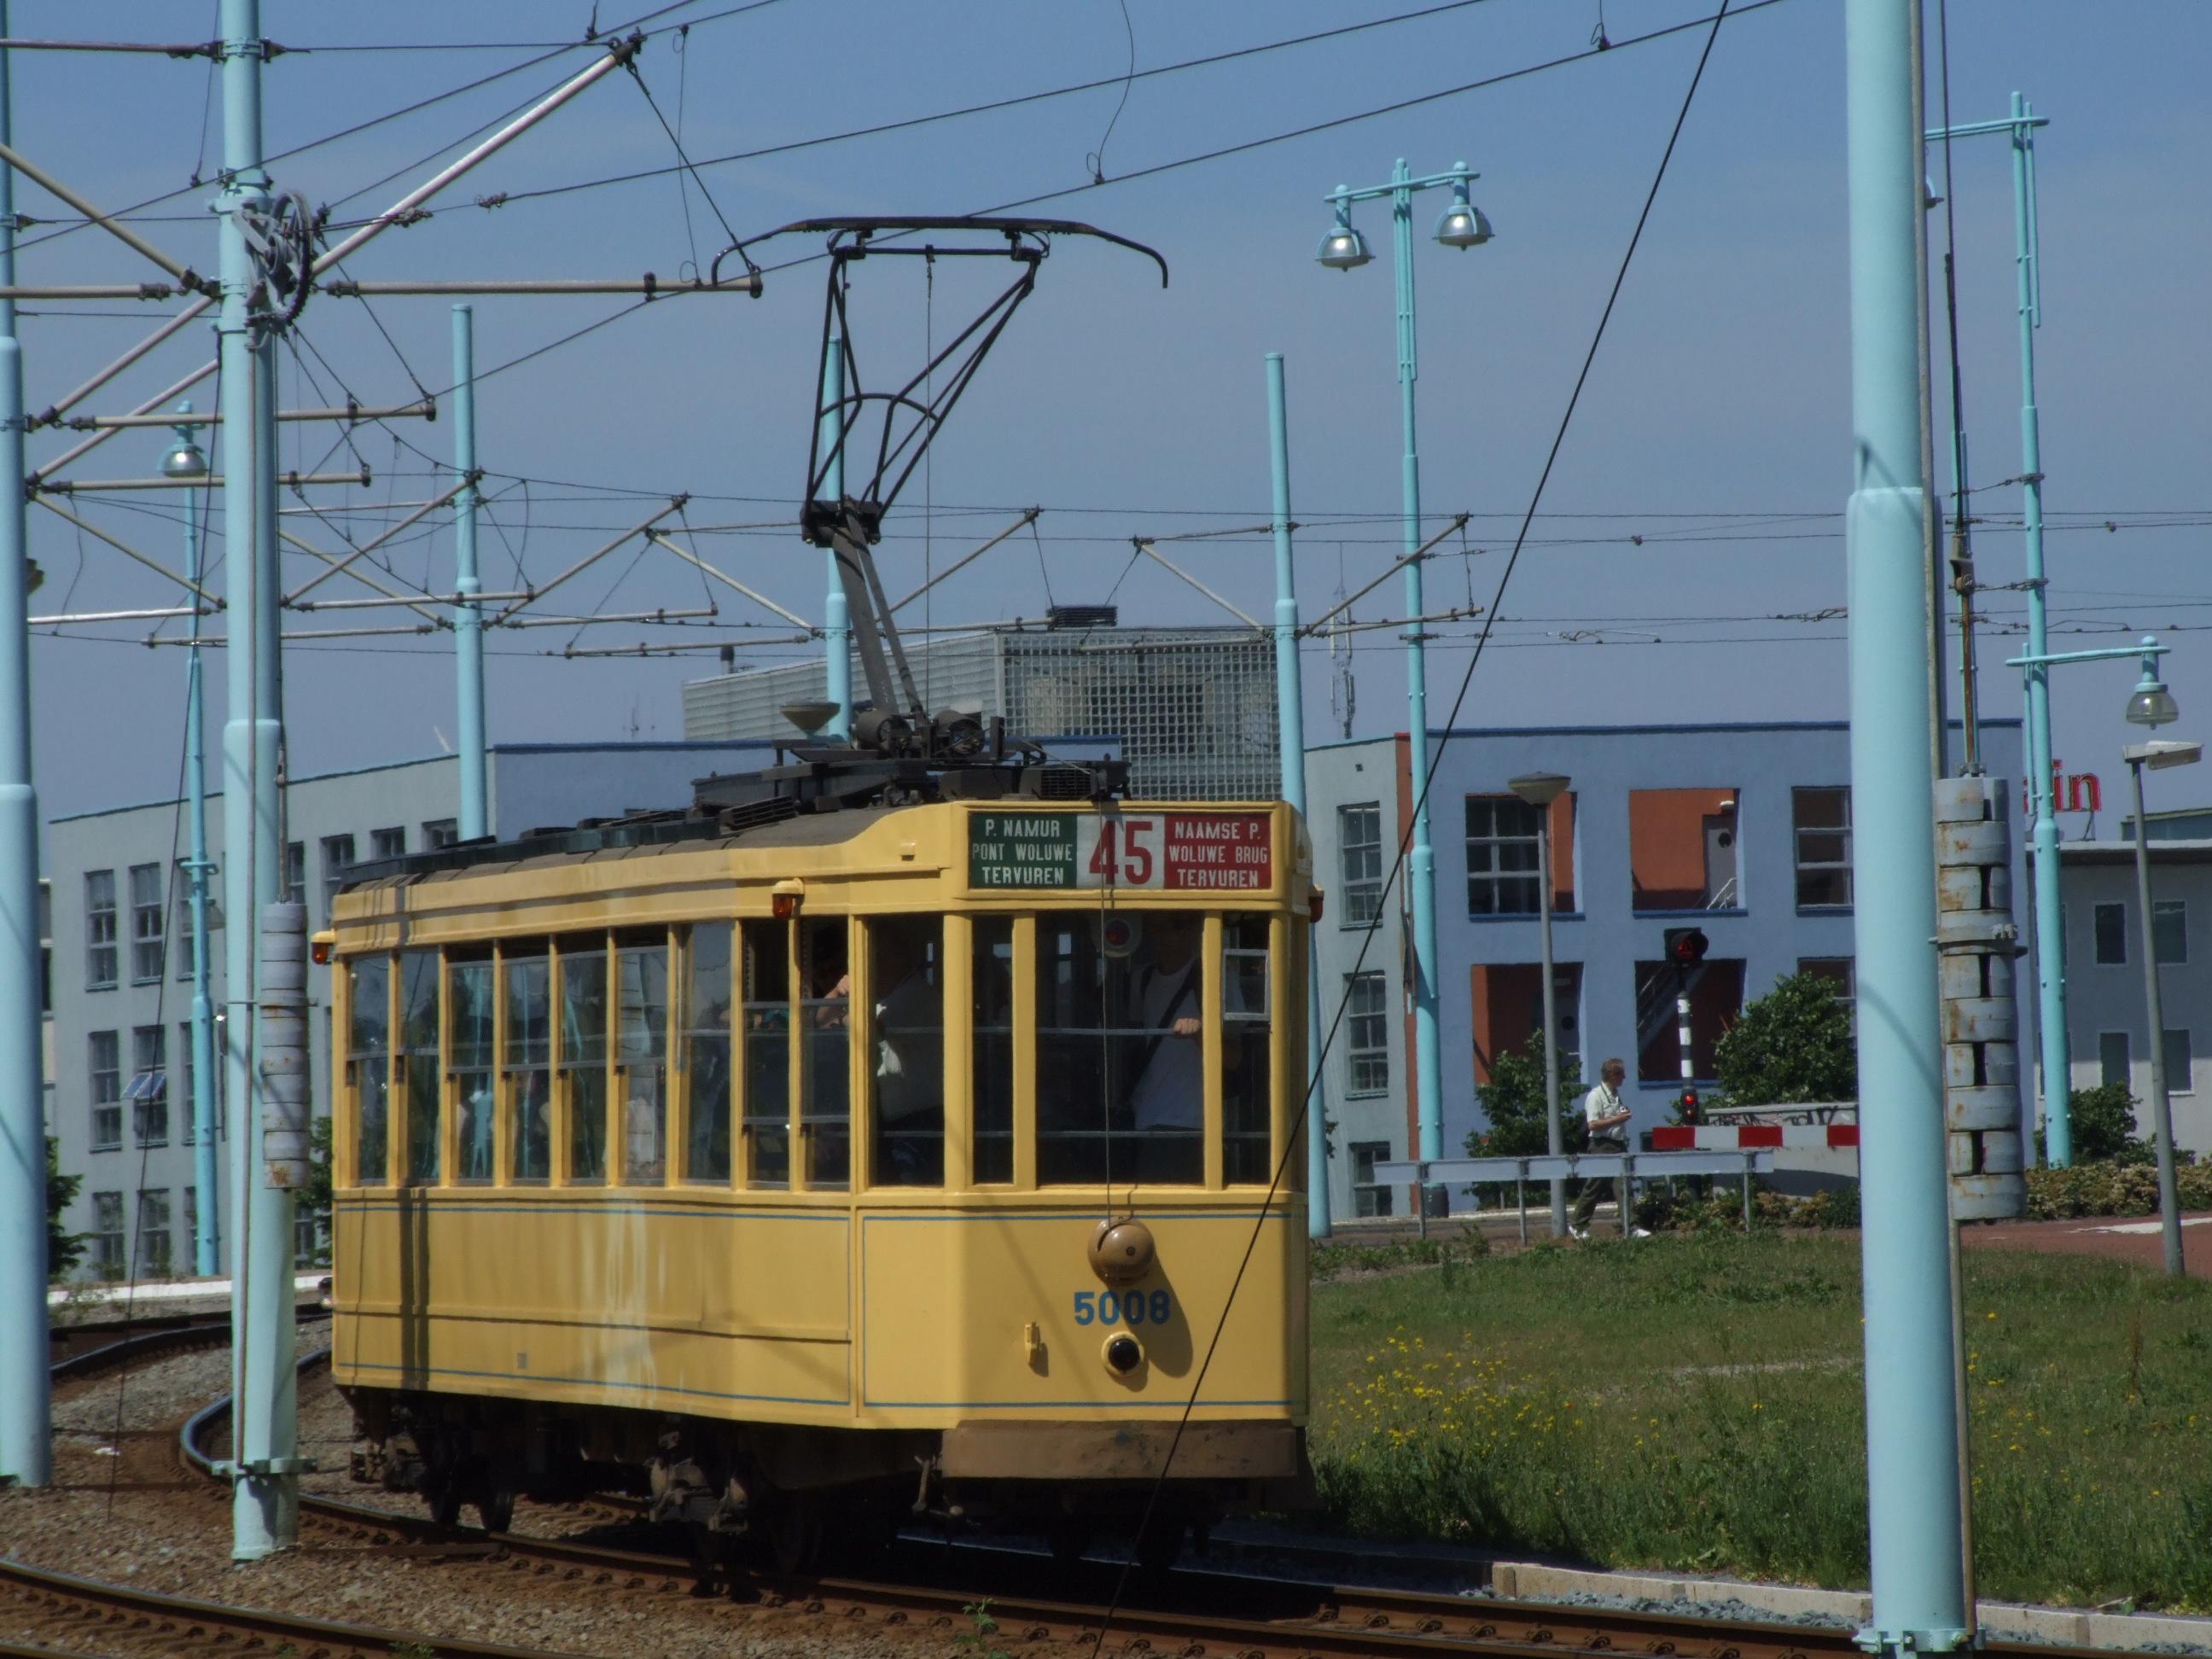 24: Rotterdam Tram 522 with trailor 1022 at Radarweg.